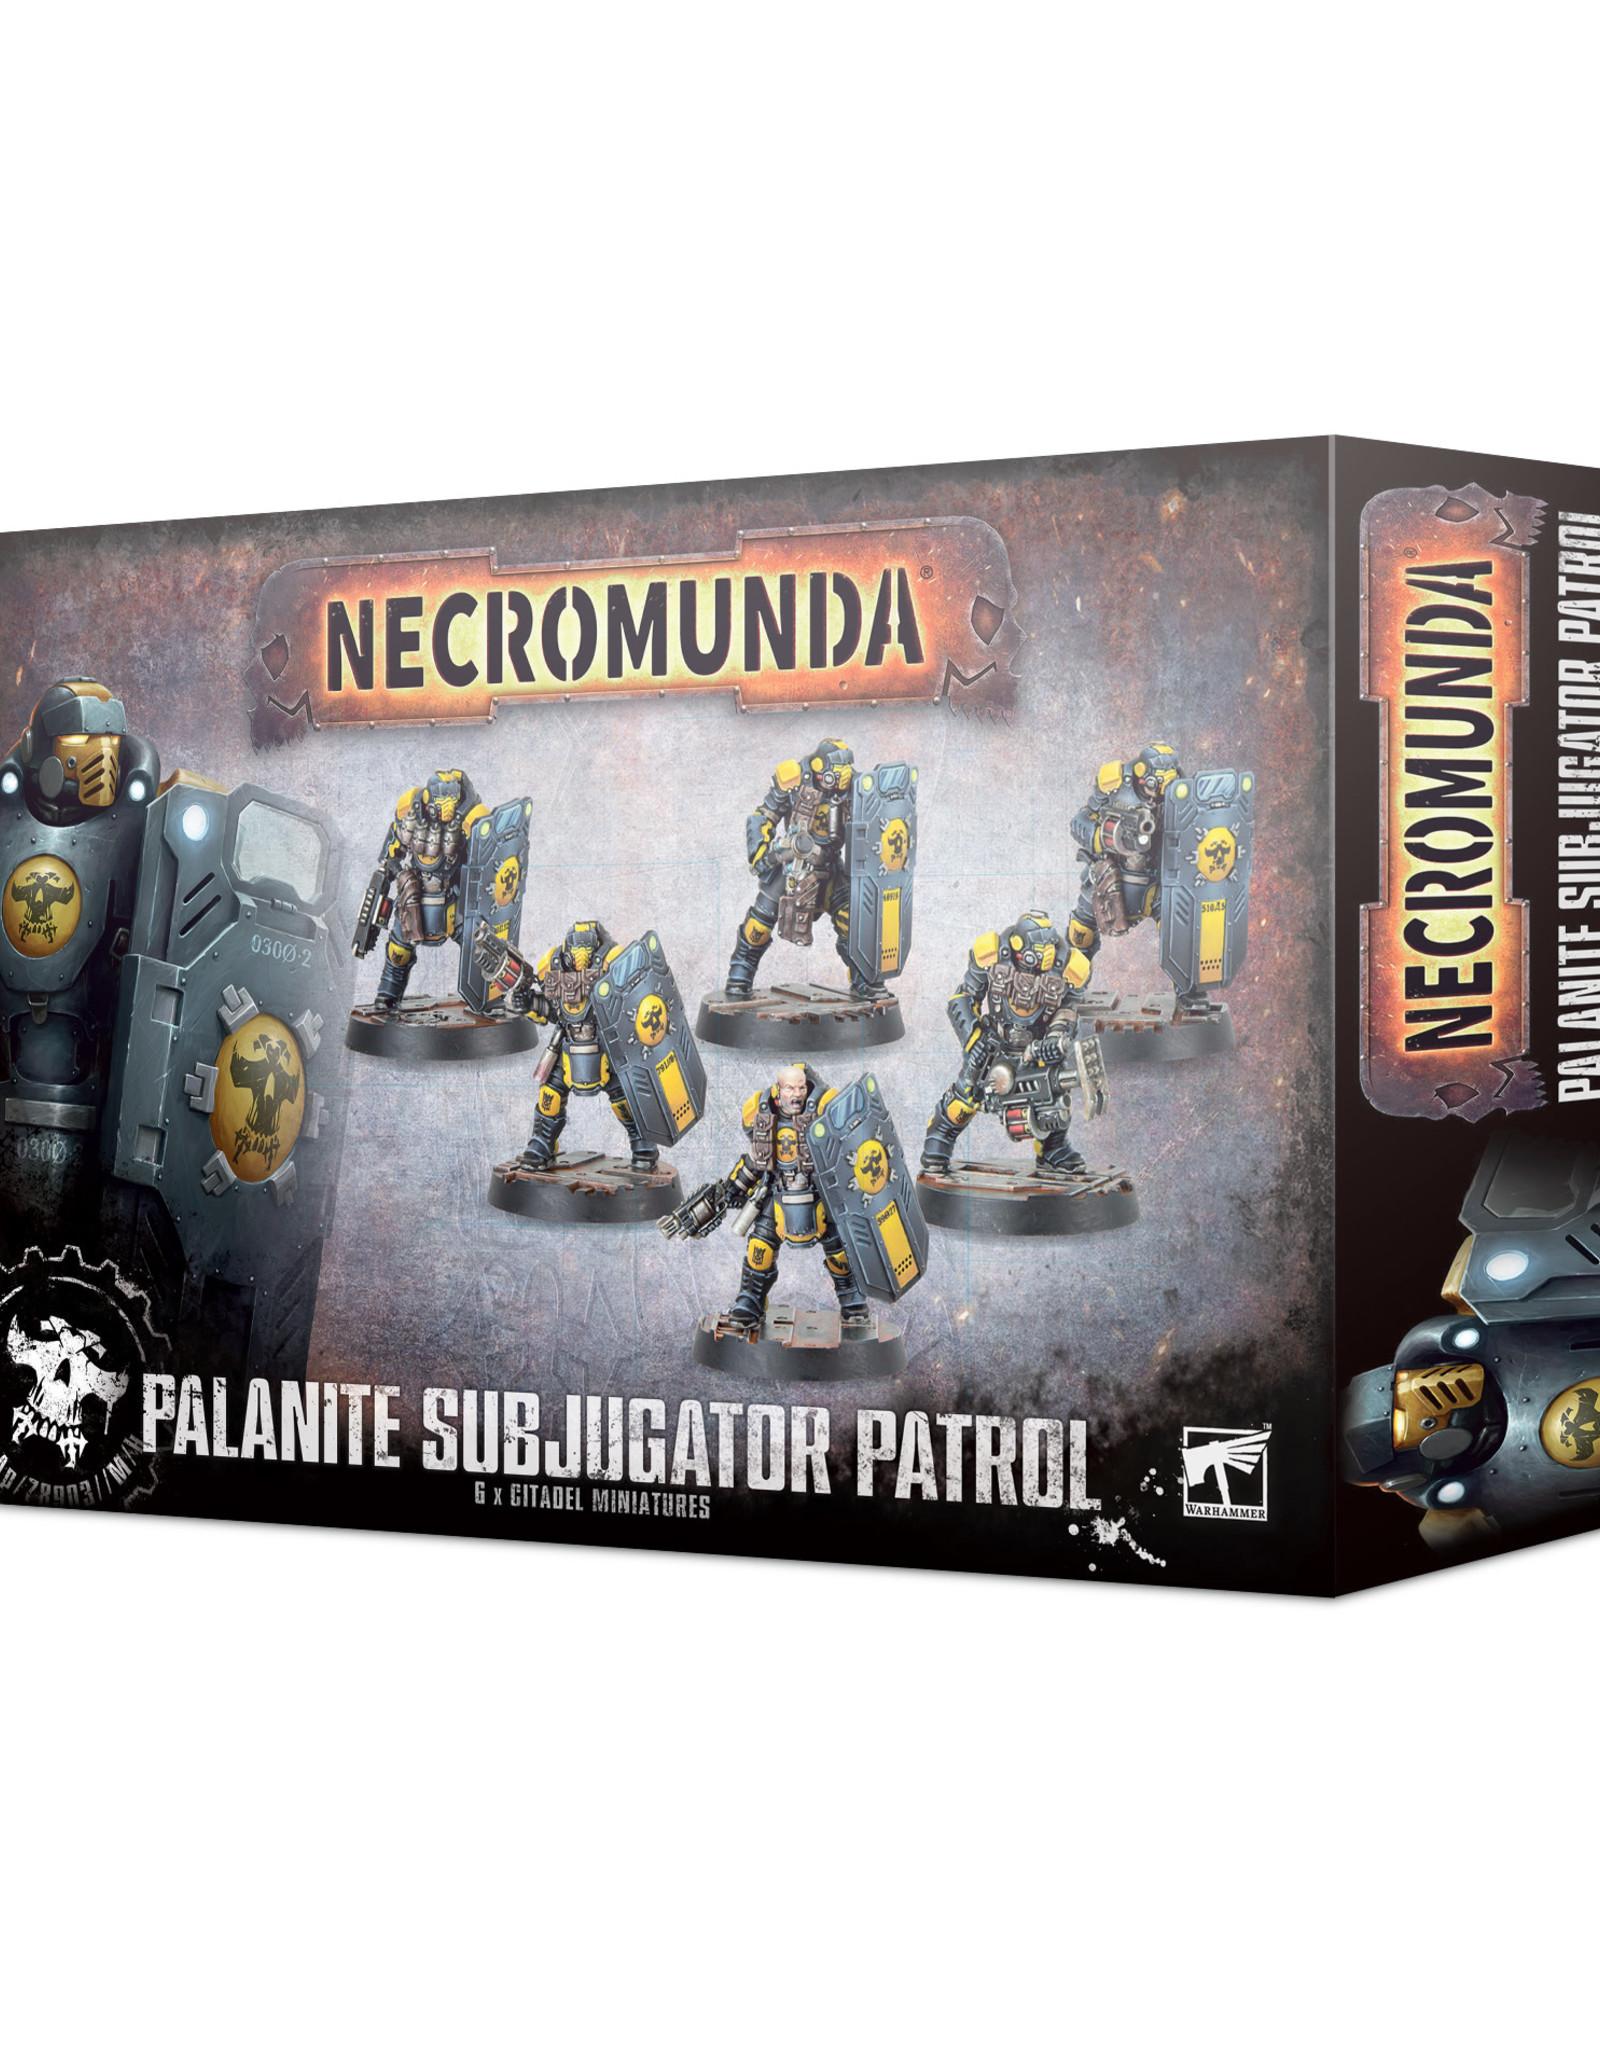 Necromunda Necromunda: Palanite Subjugator Patrol